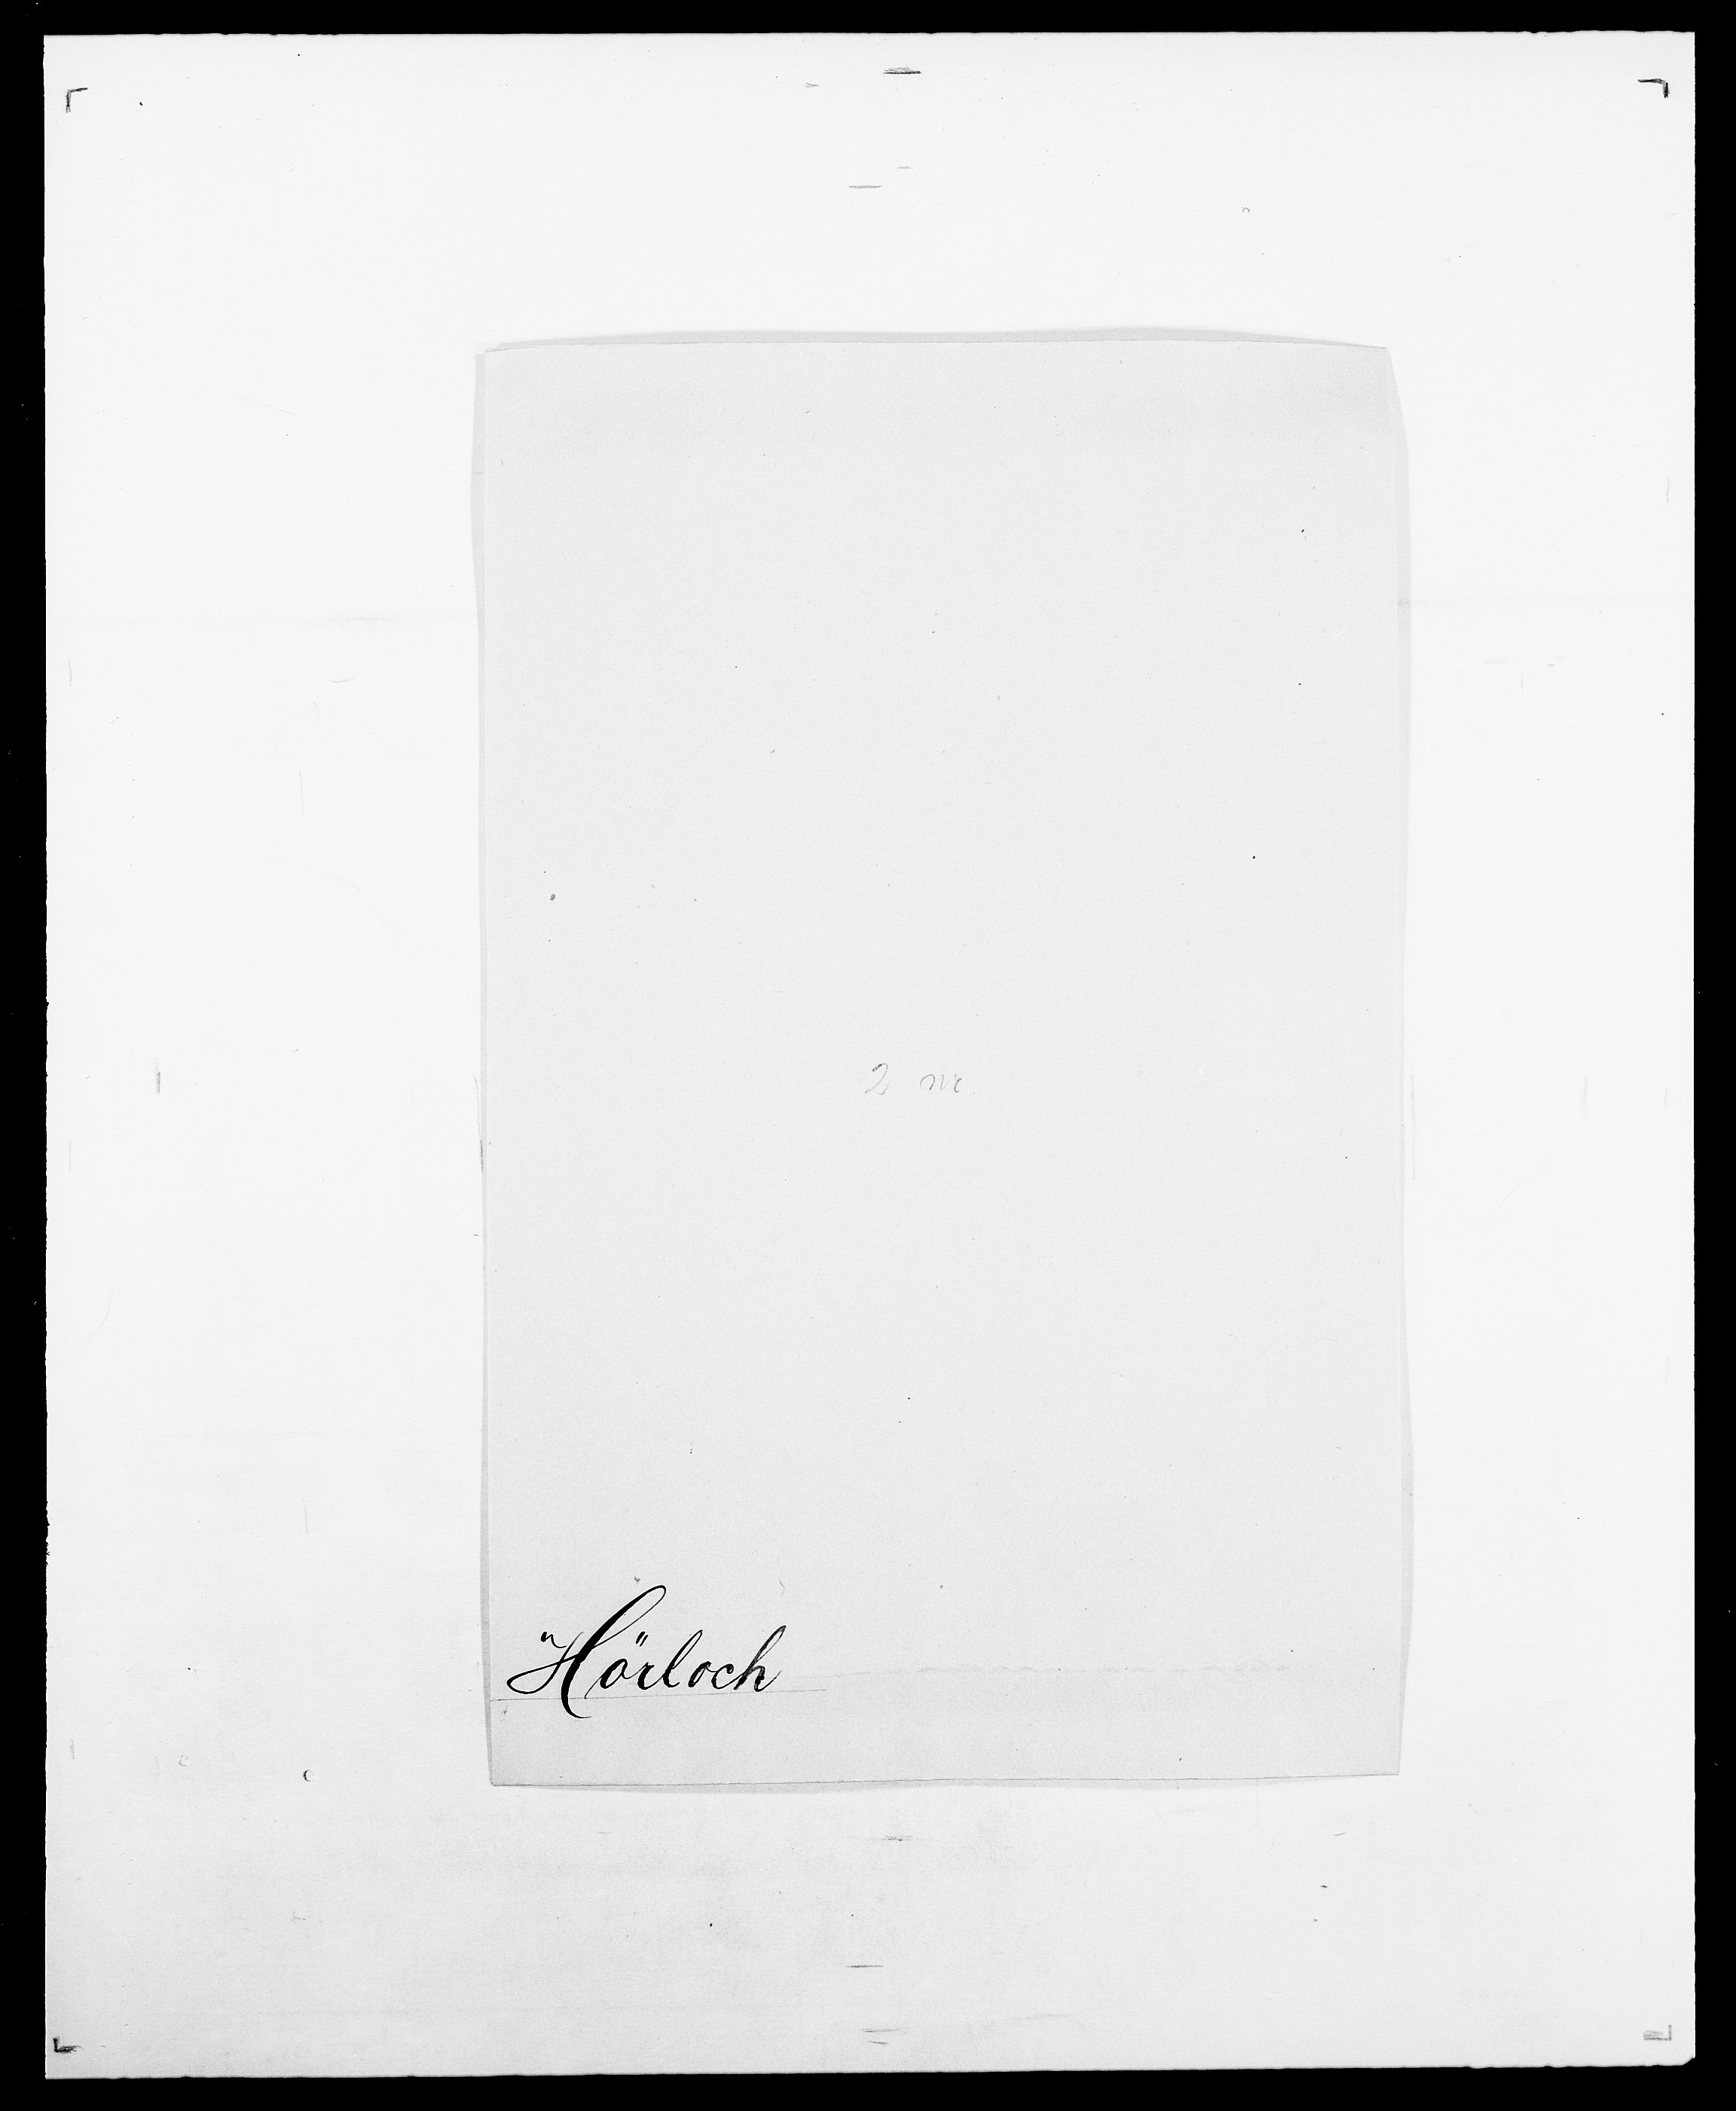 SAO, Delgobe, Charles Antoine - samling, D/Da/L0019: van der Hude - Joys, s. 382